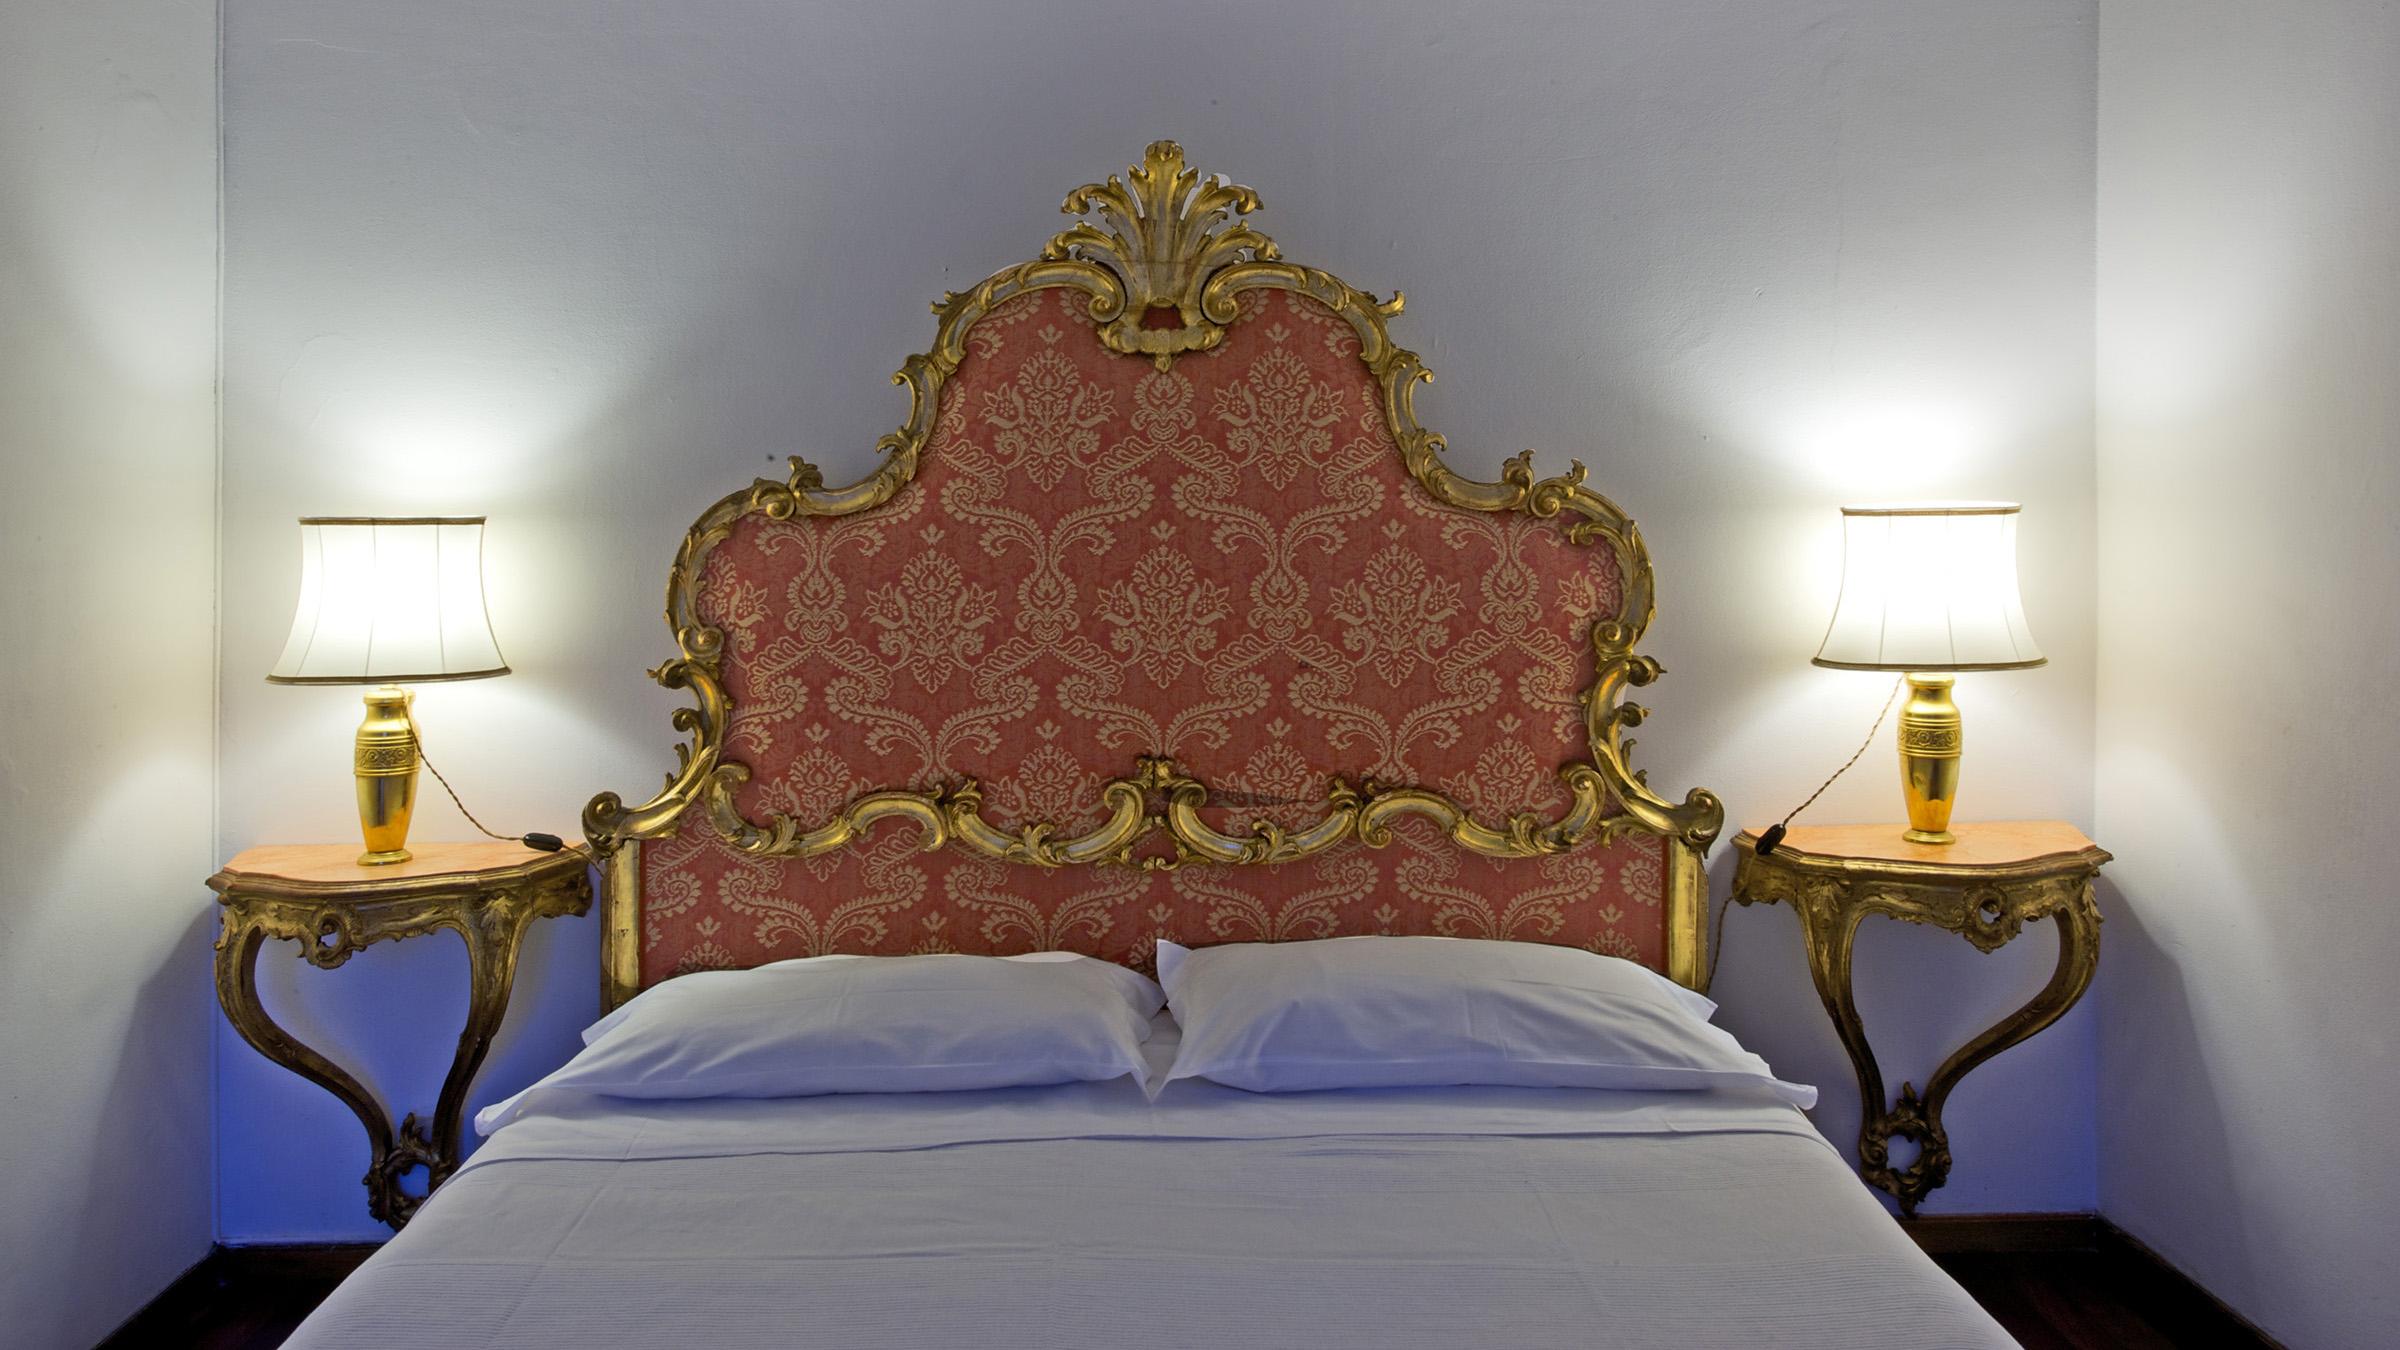 Cristina Rossi Bed and Breakfast in Bologna